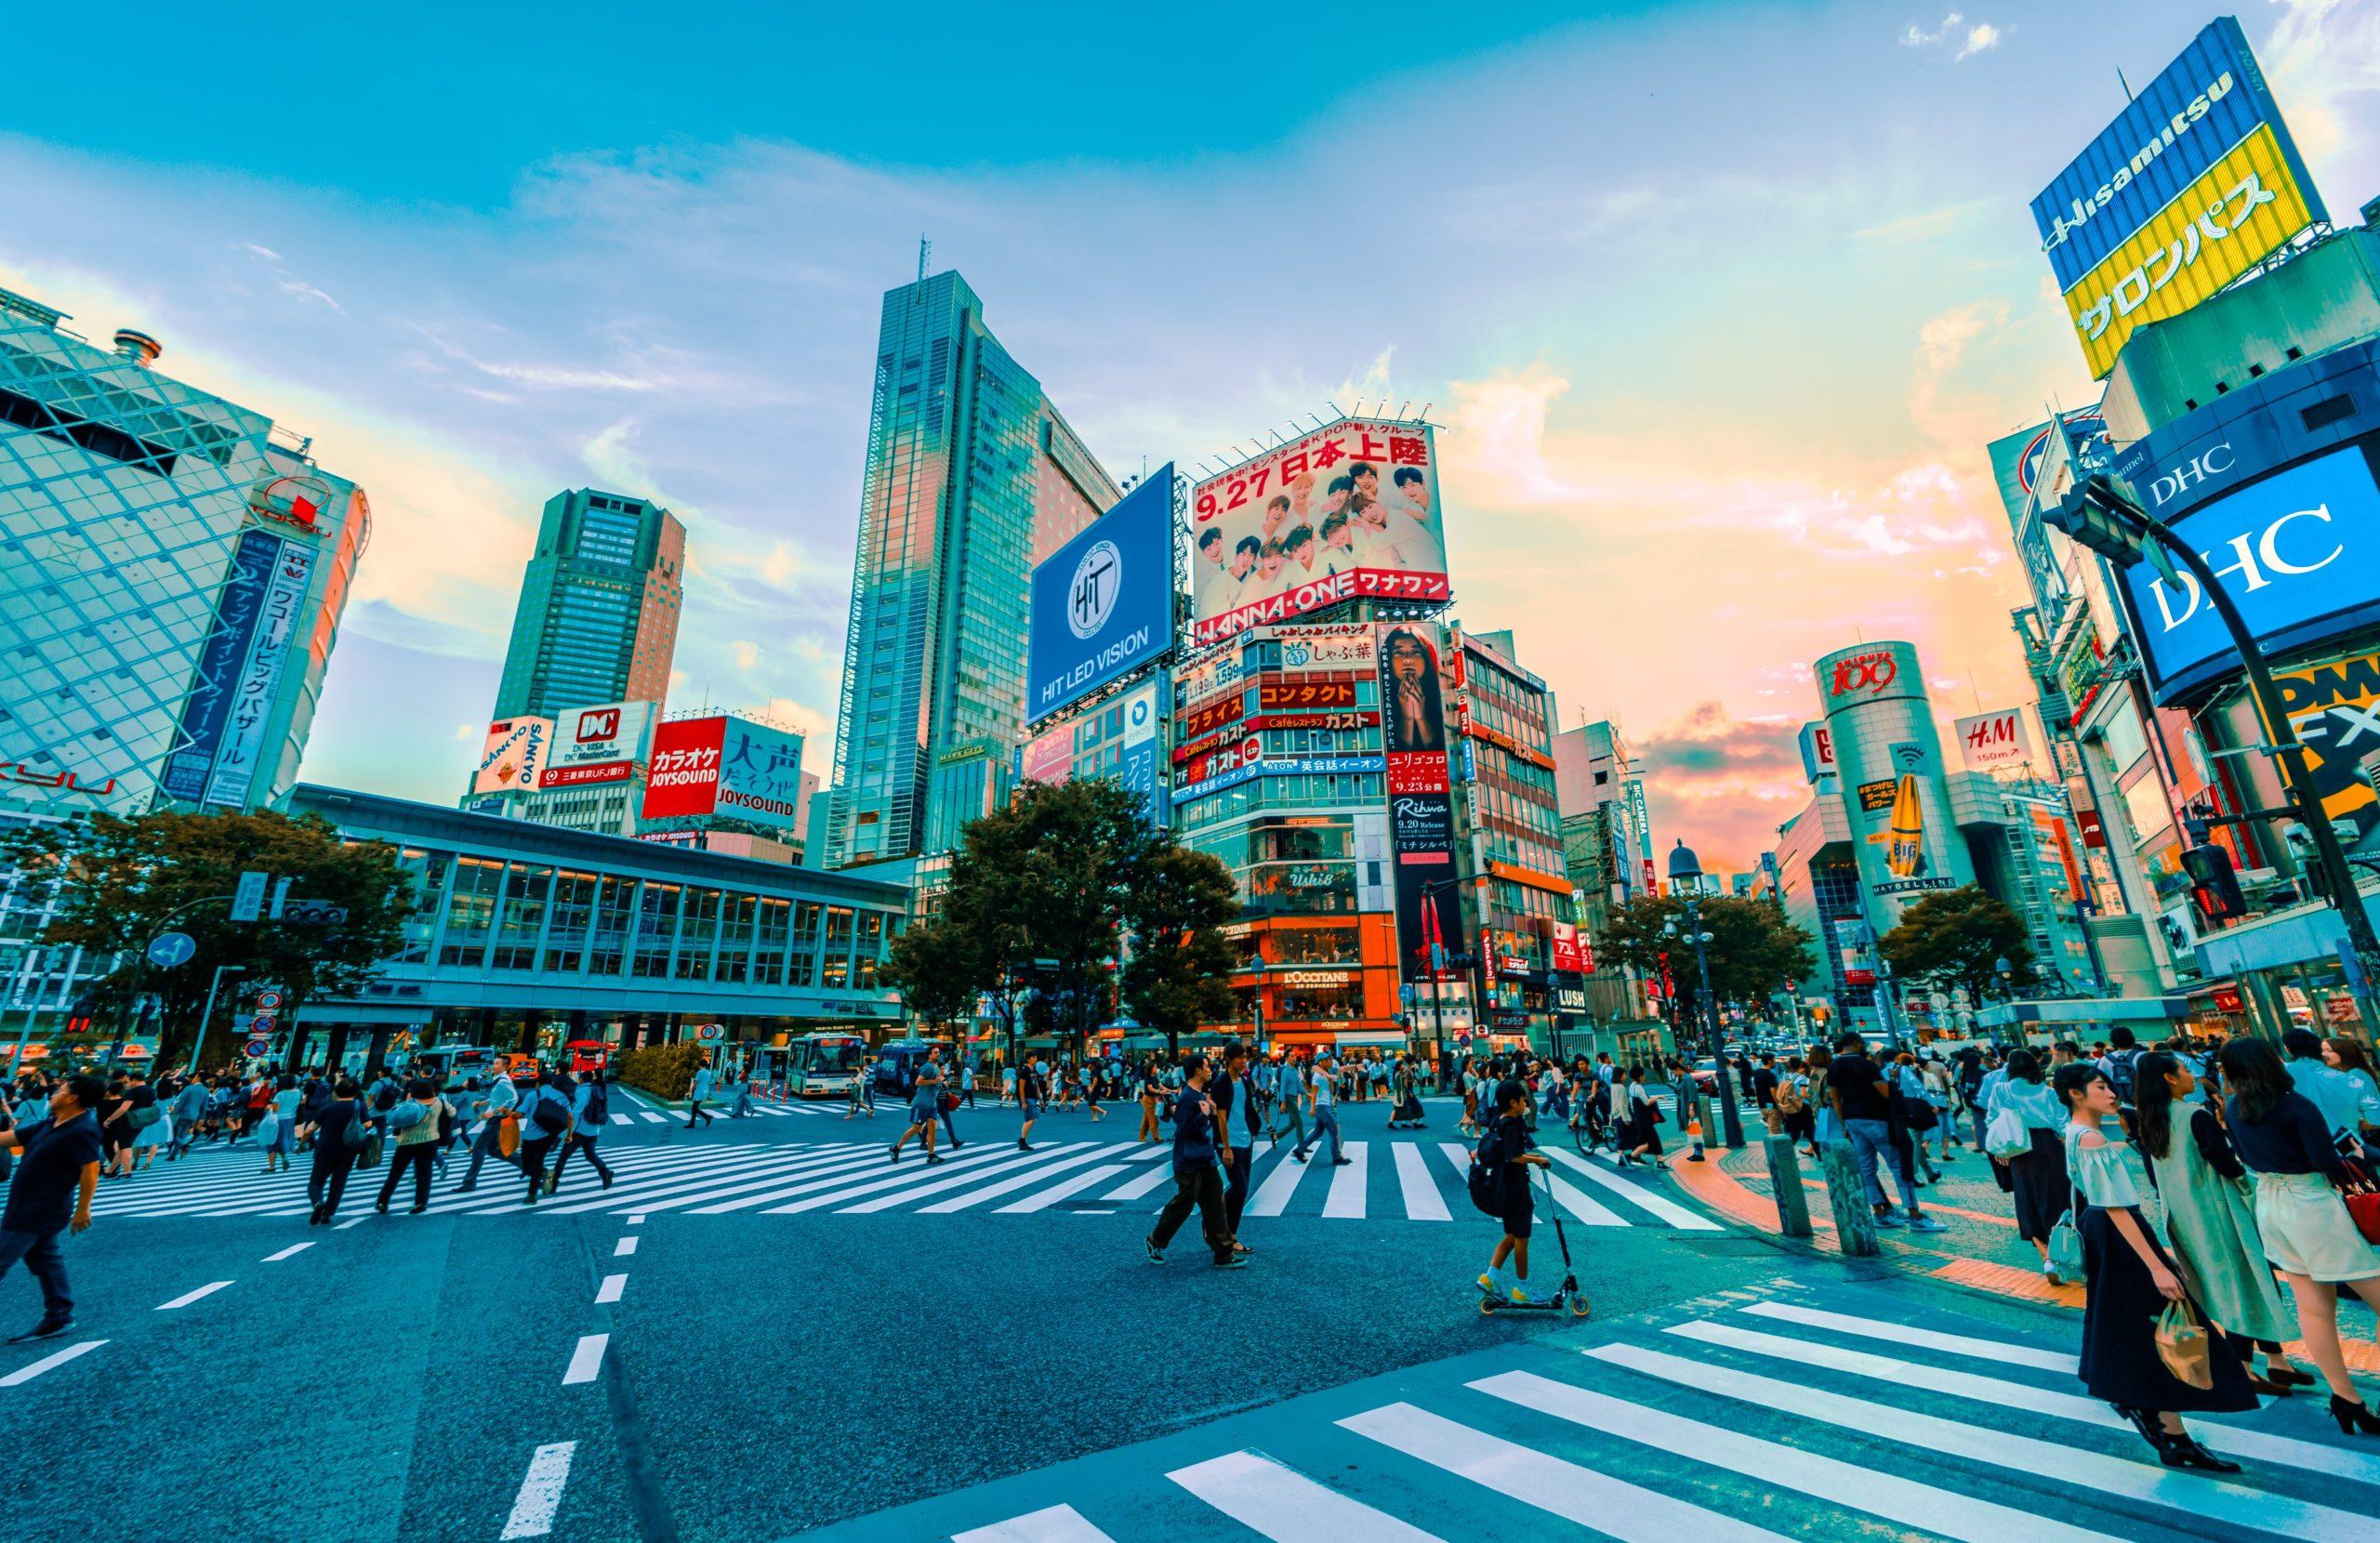 【Japanese Vocabulary】Buildings:建物(たてもの)